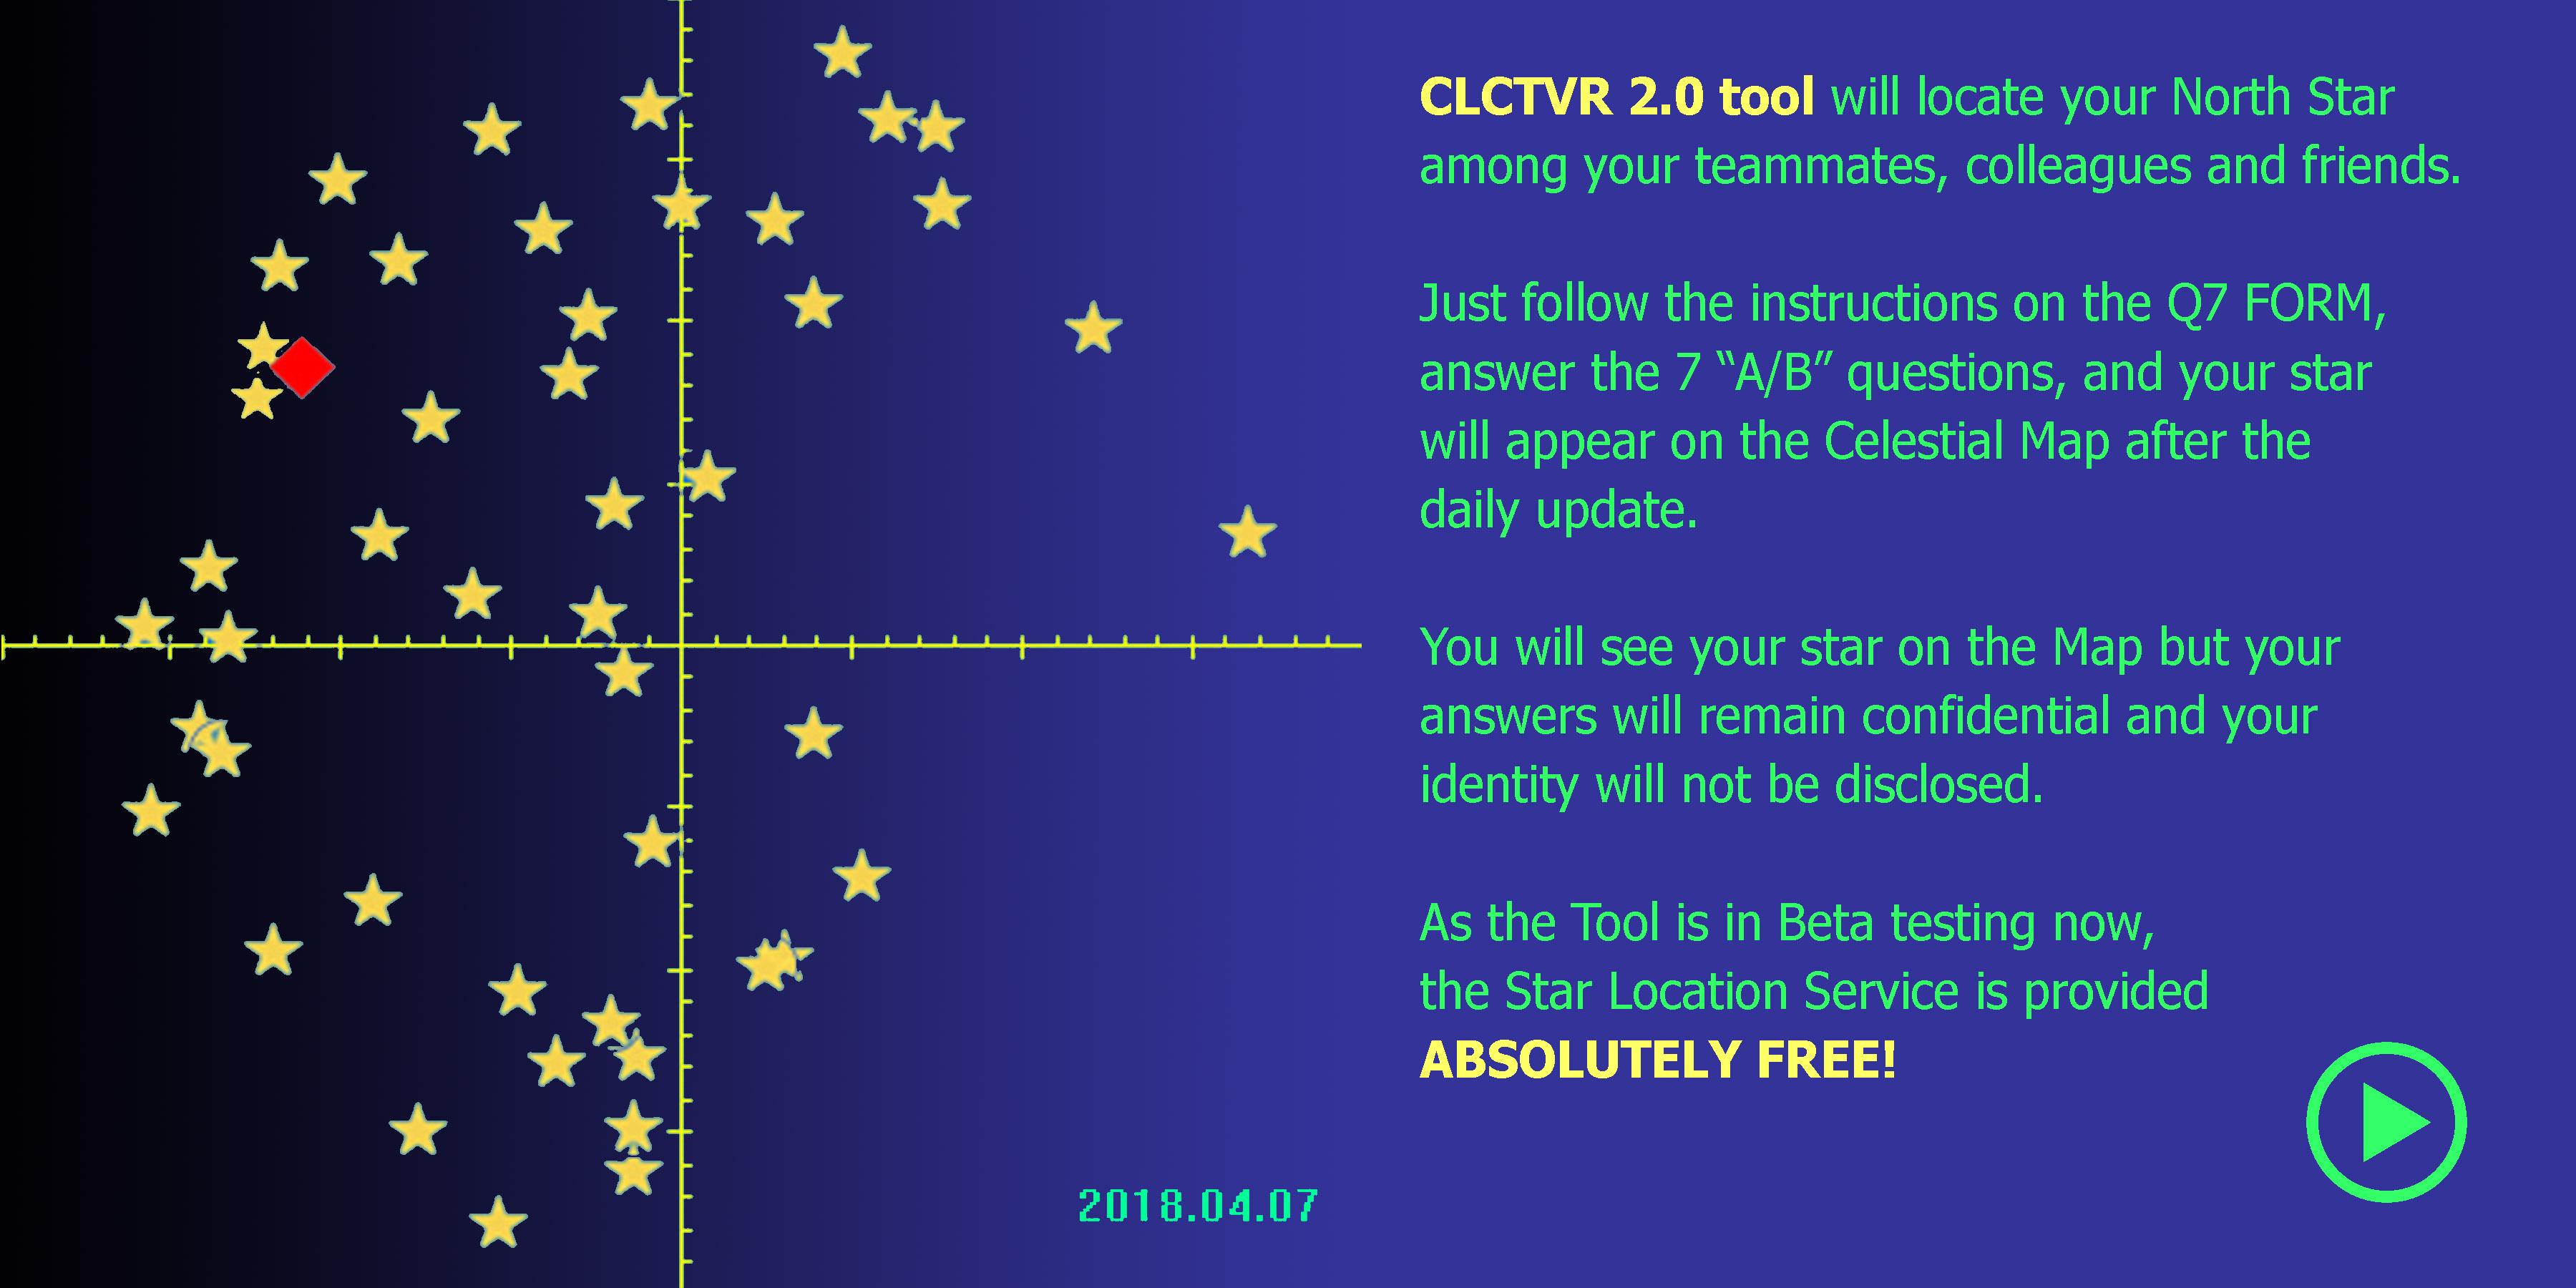 CLCTVR 2.0